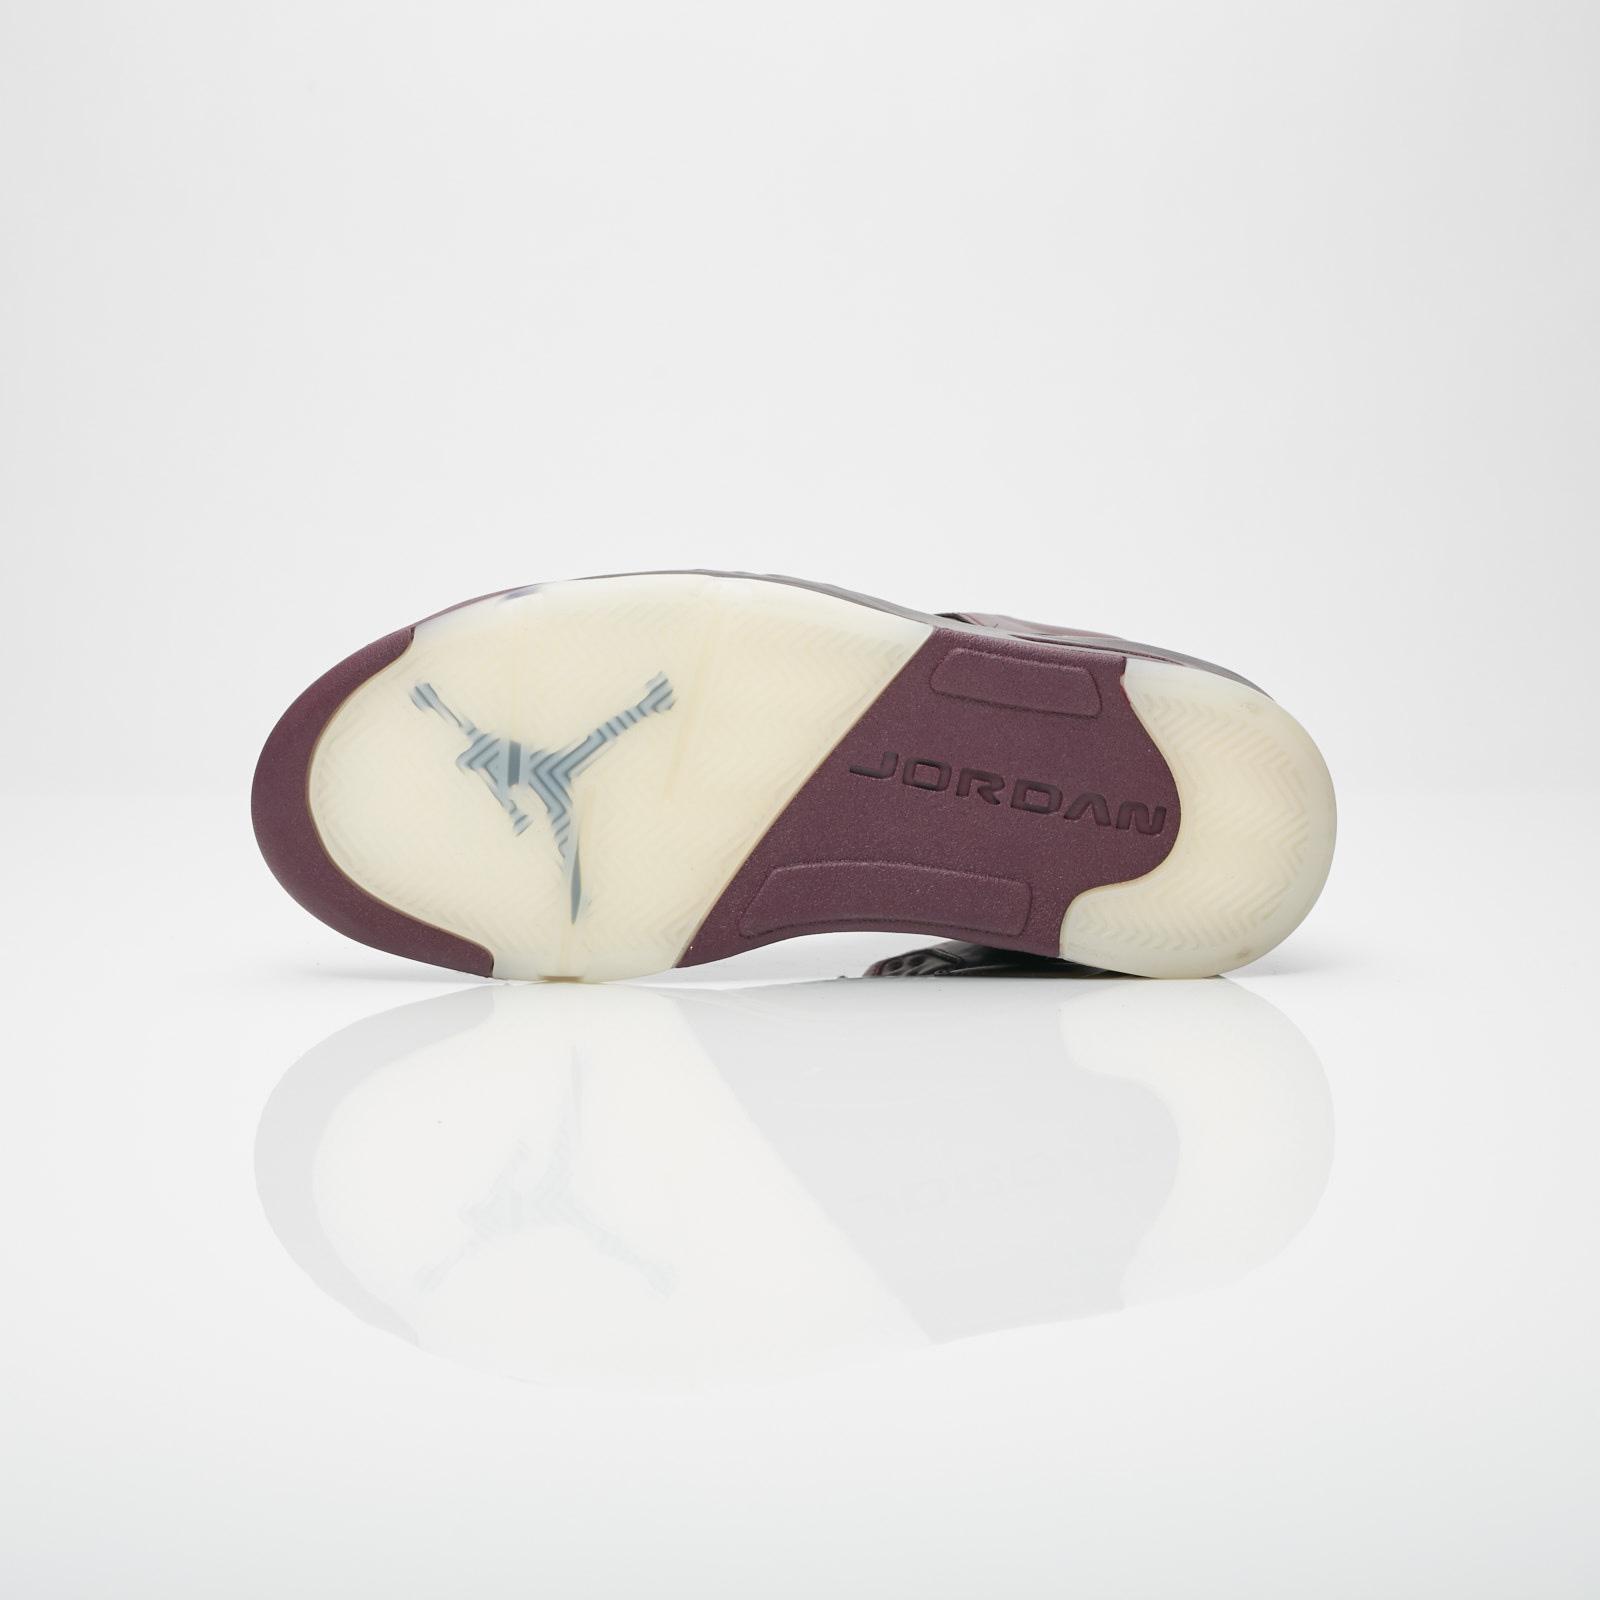 online retailer a193e ee23a Jordan Brand Air Jordan 5 Retro Premium - 881432-612 ...